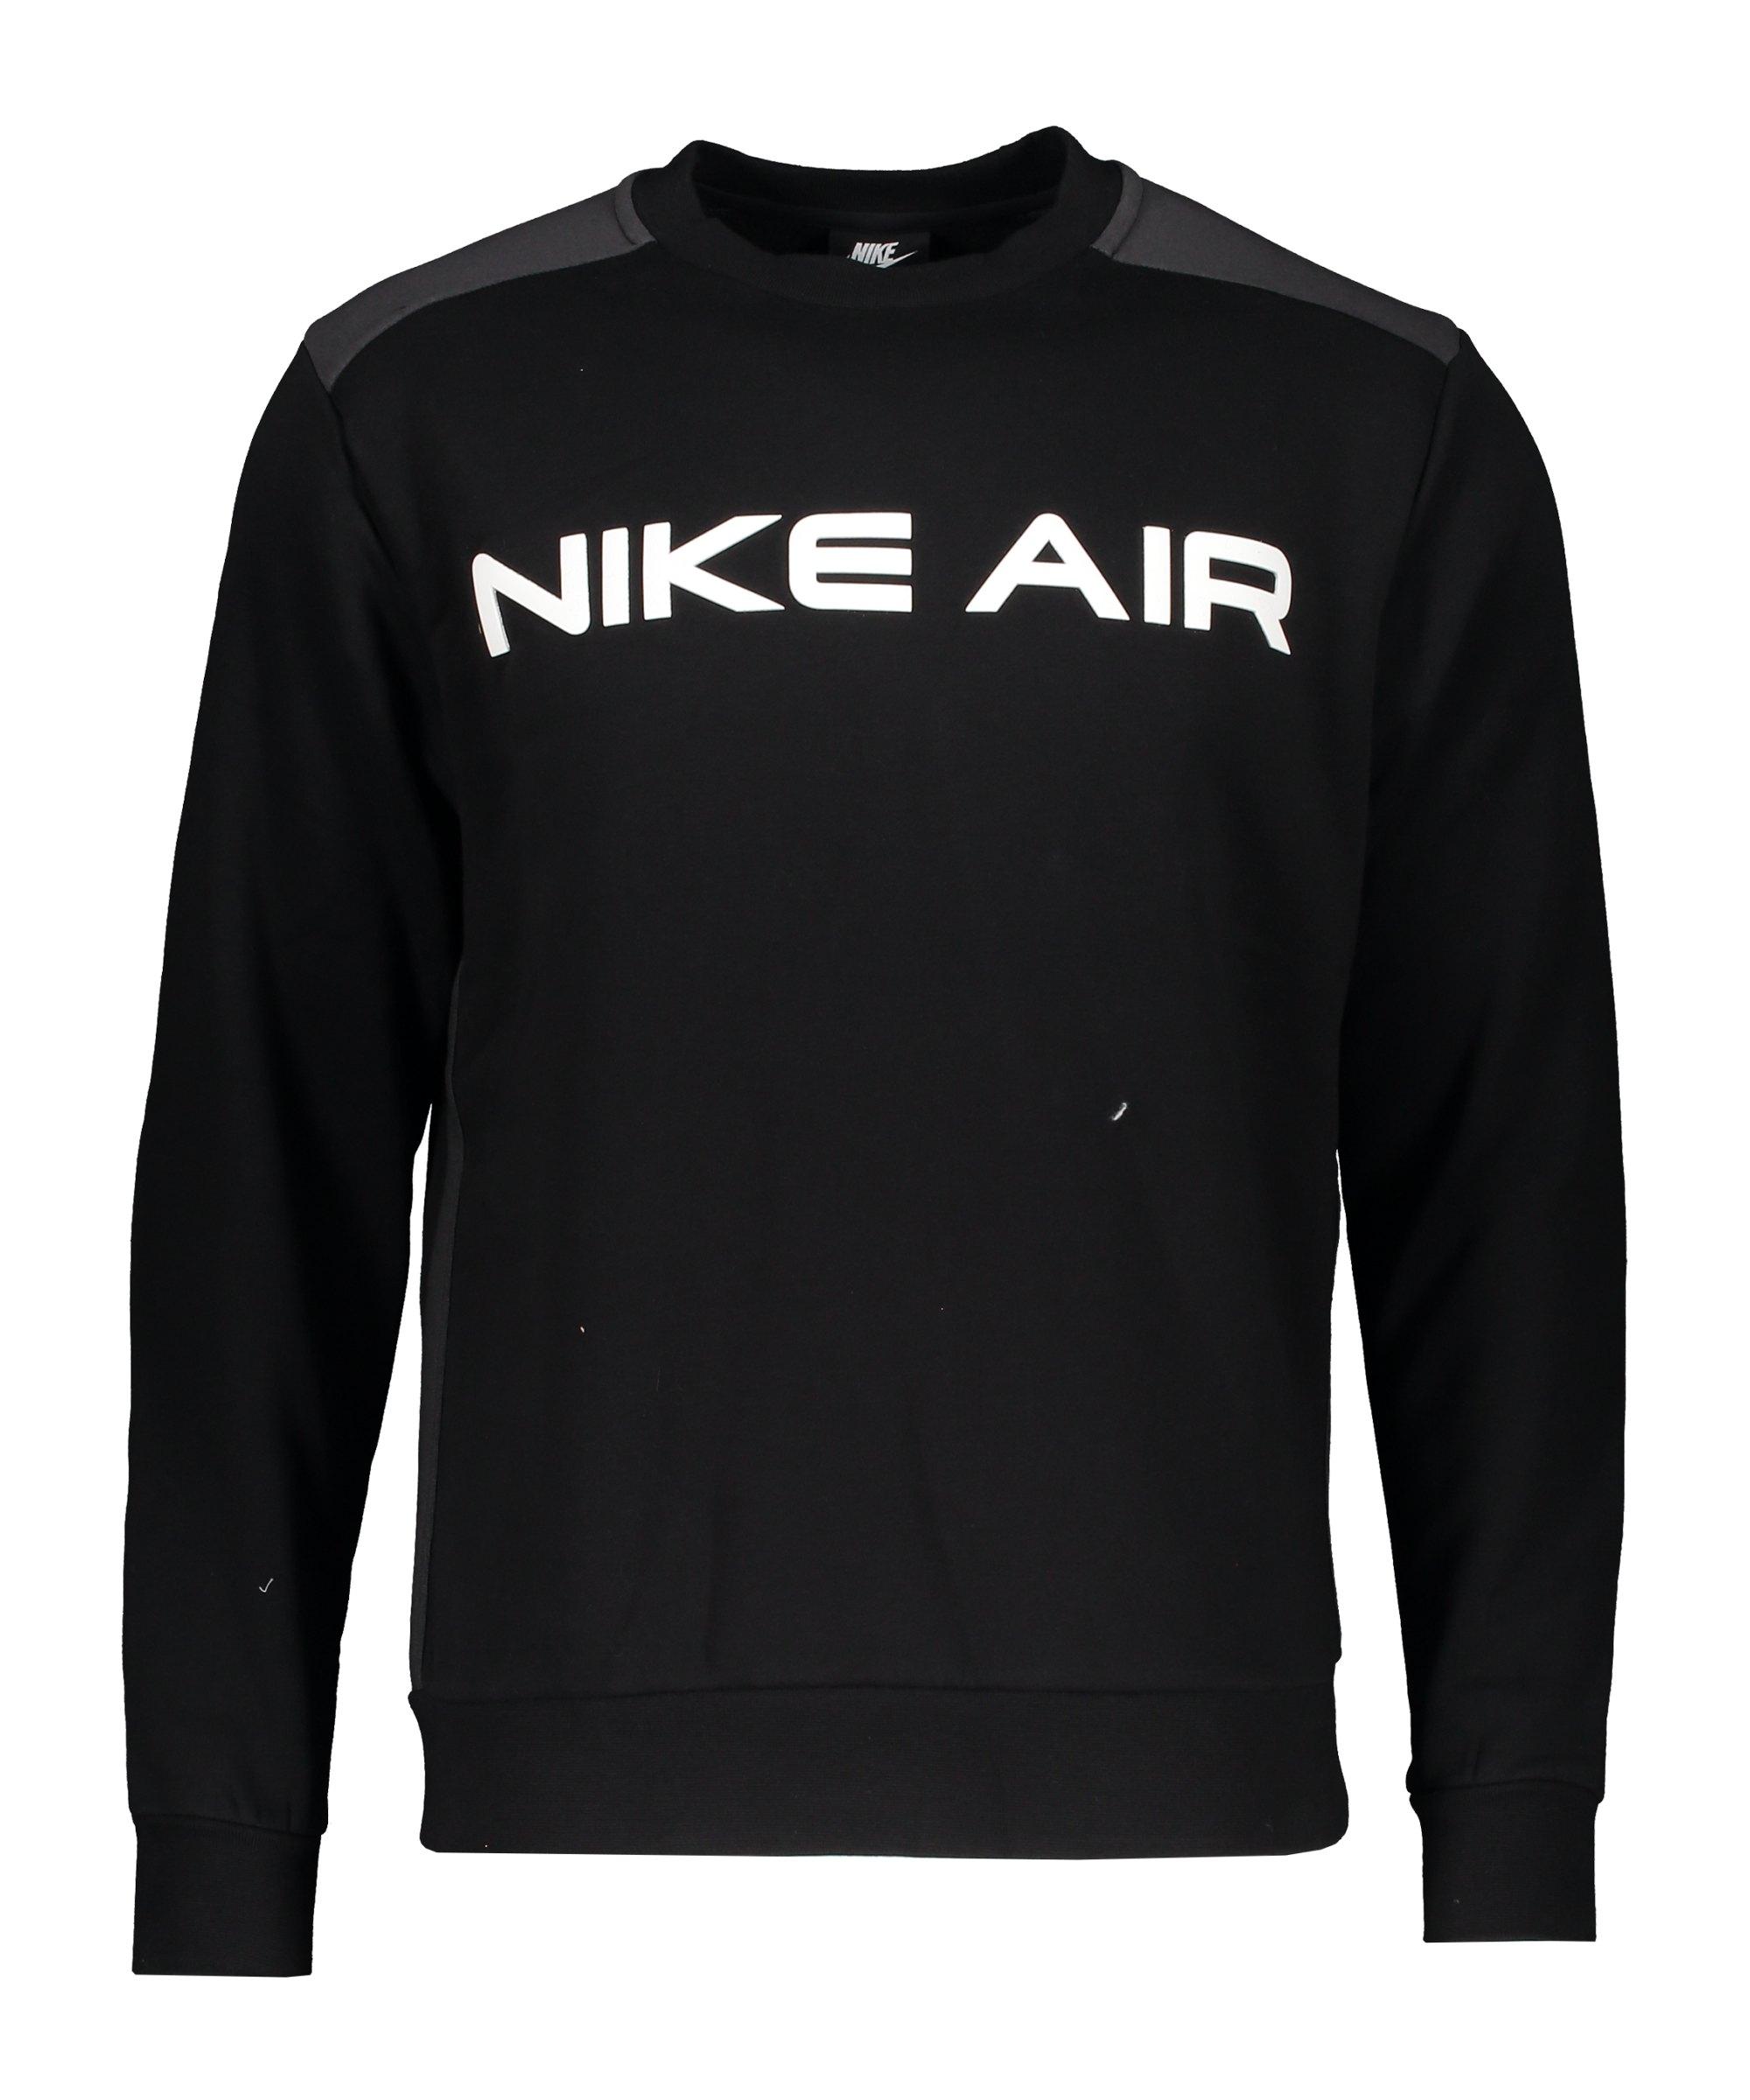 Nike Air Fleece Sweatshirt Schwarz Grau F010 - schwarz